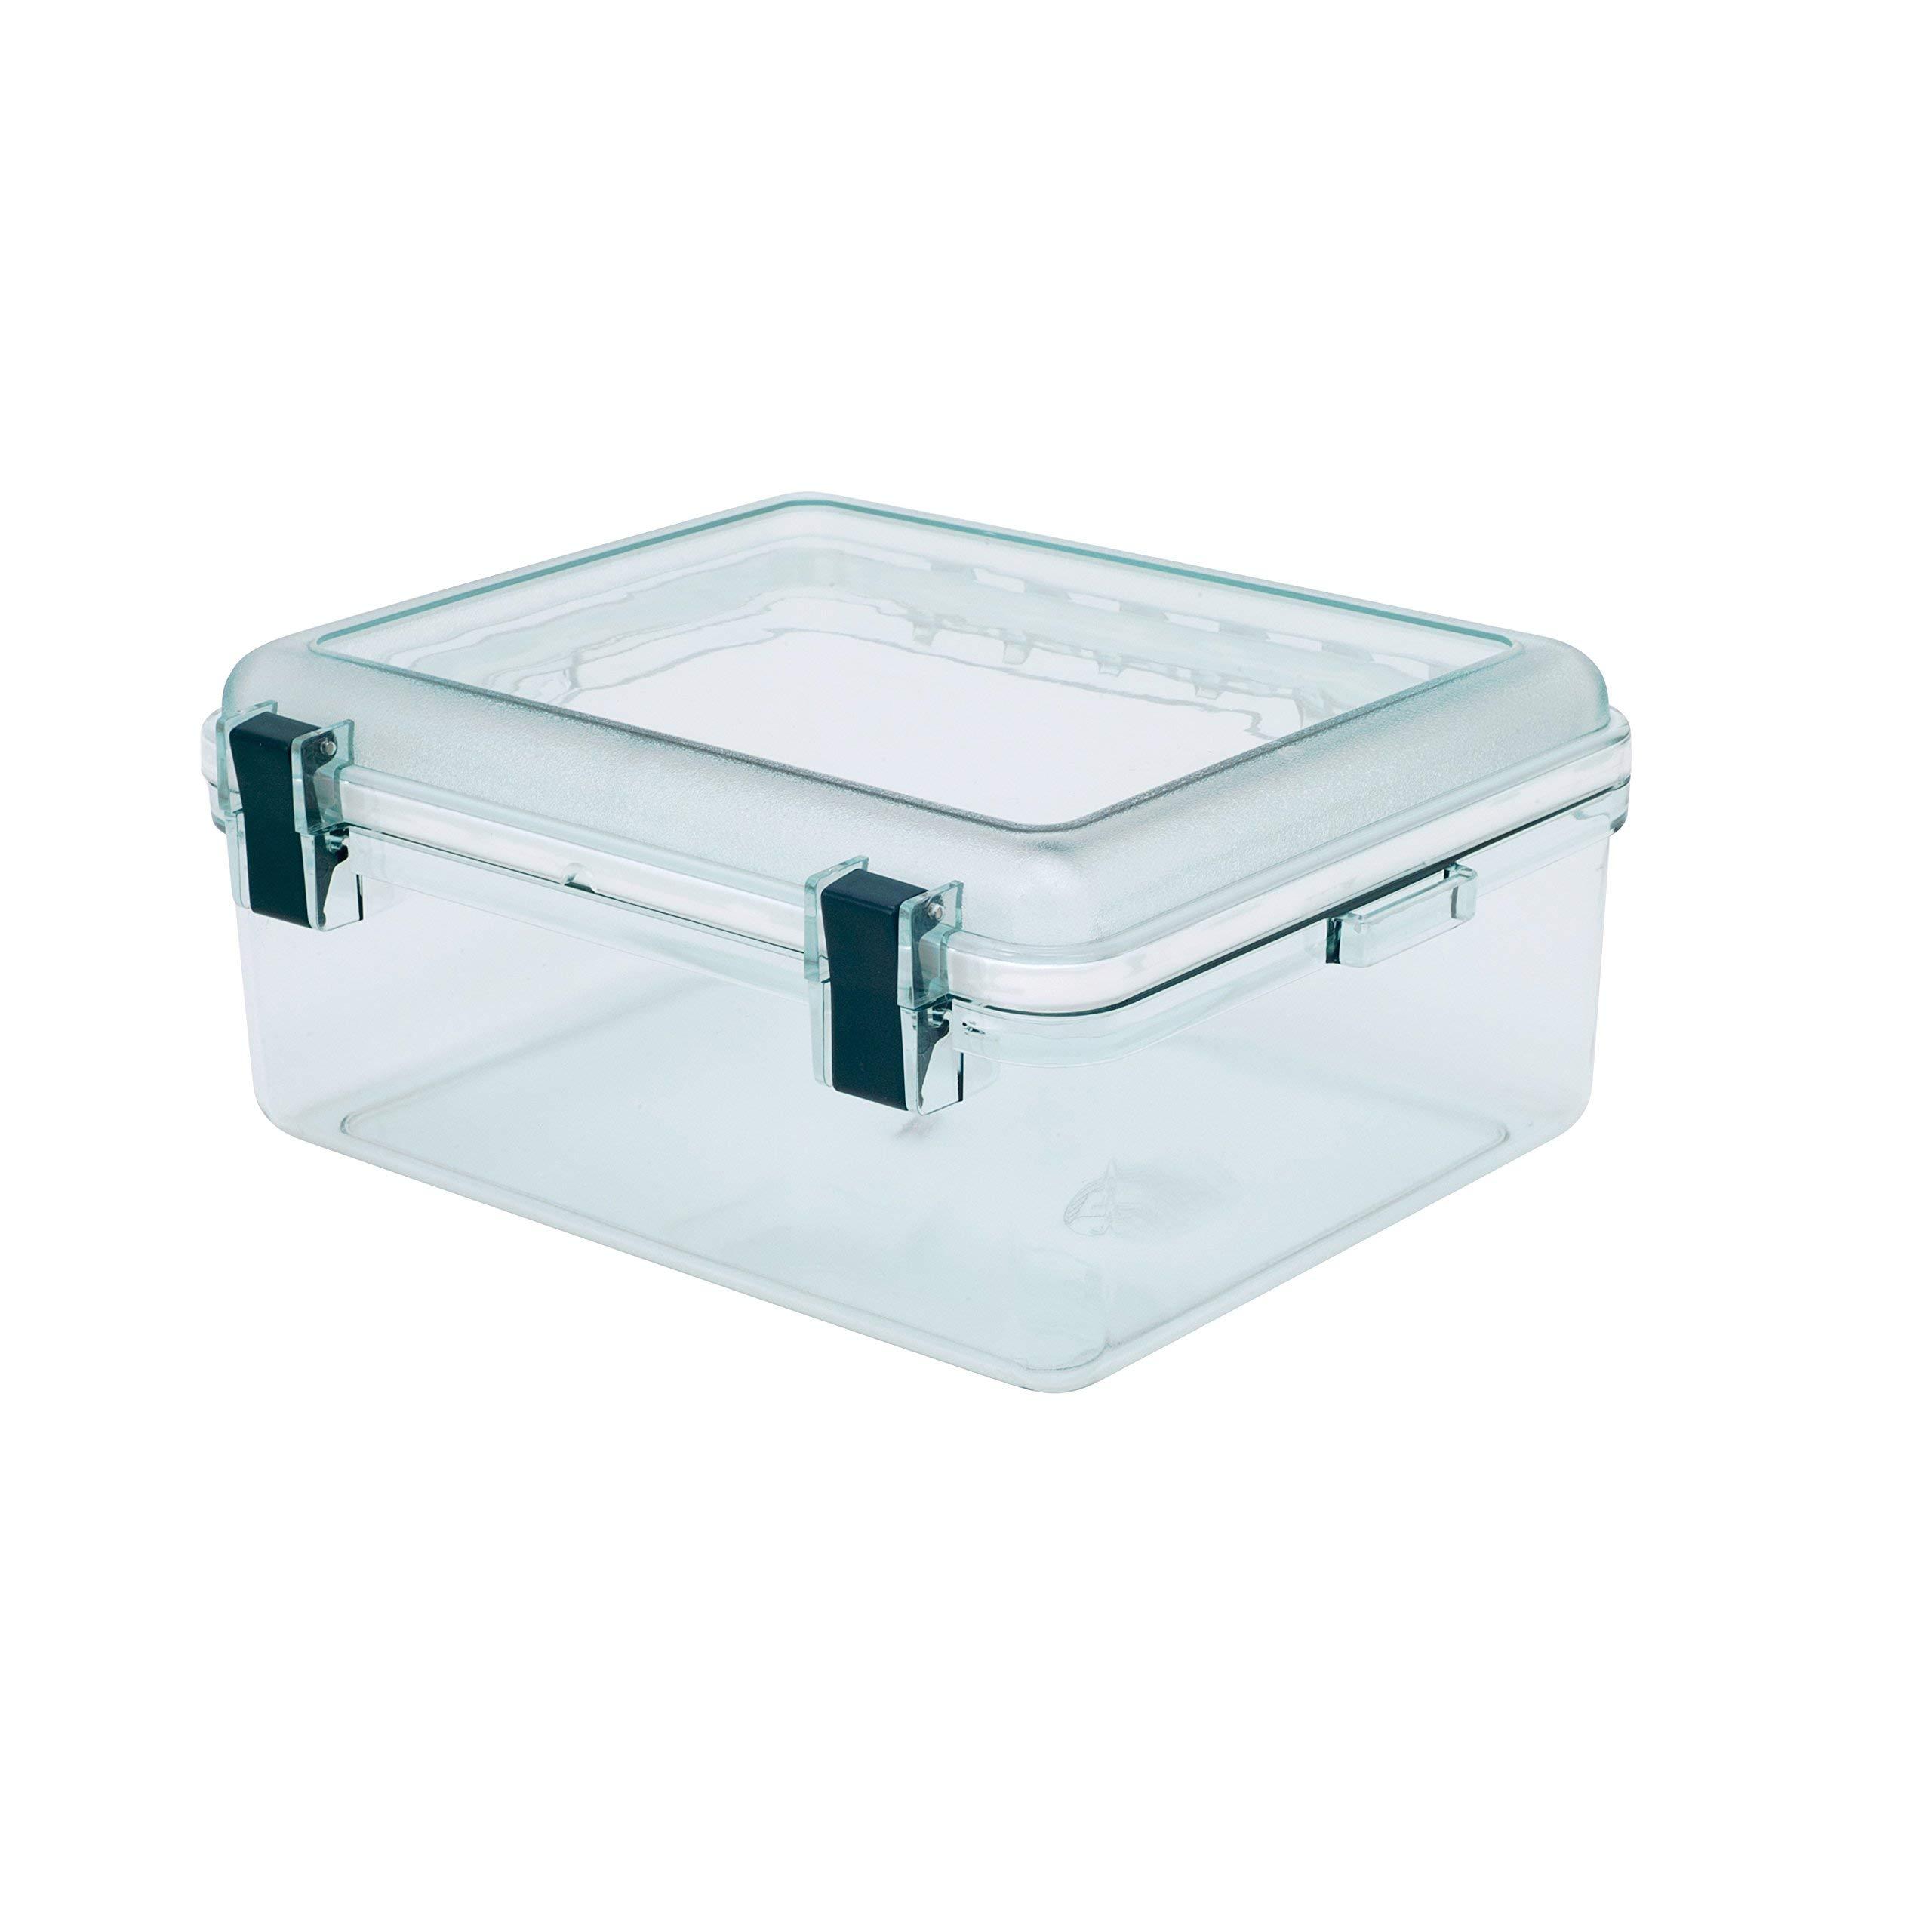 GSI Outdooors - Watertight, Crushproof, Lexan Gear Box (Renewed) by GSI Outdoors